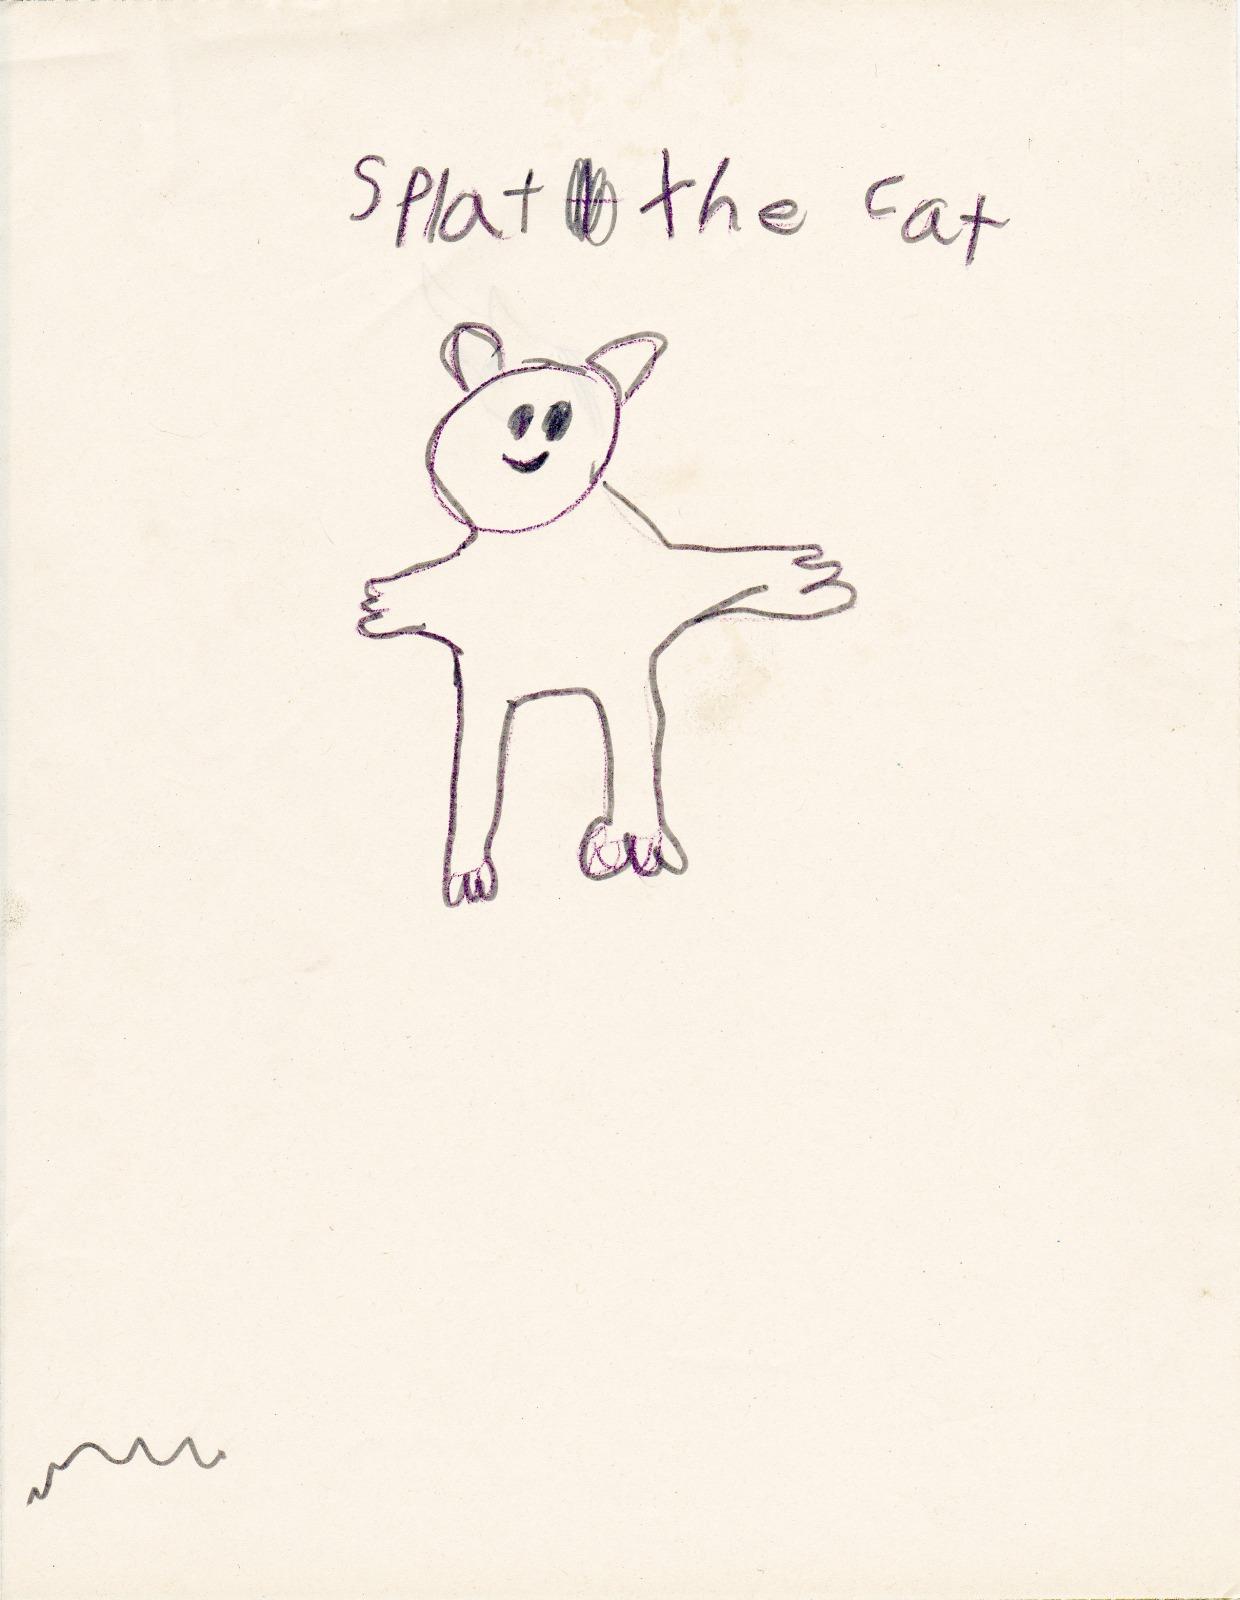 Splat the Cat, artwork by Alana Robinson